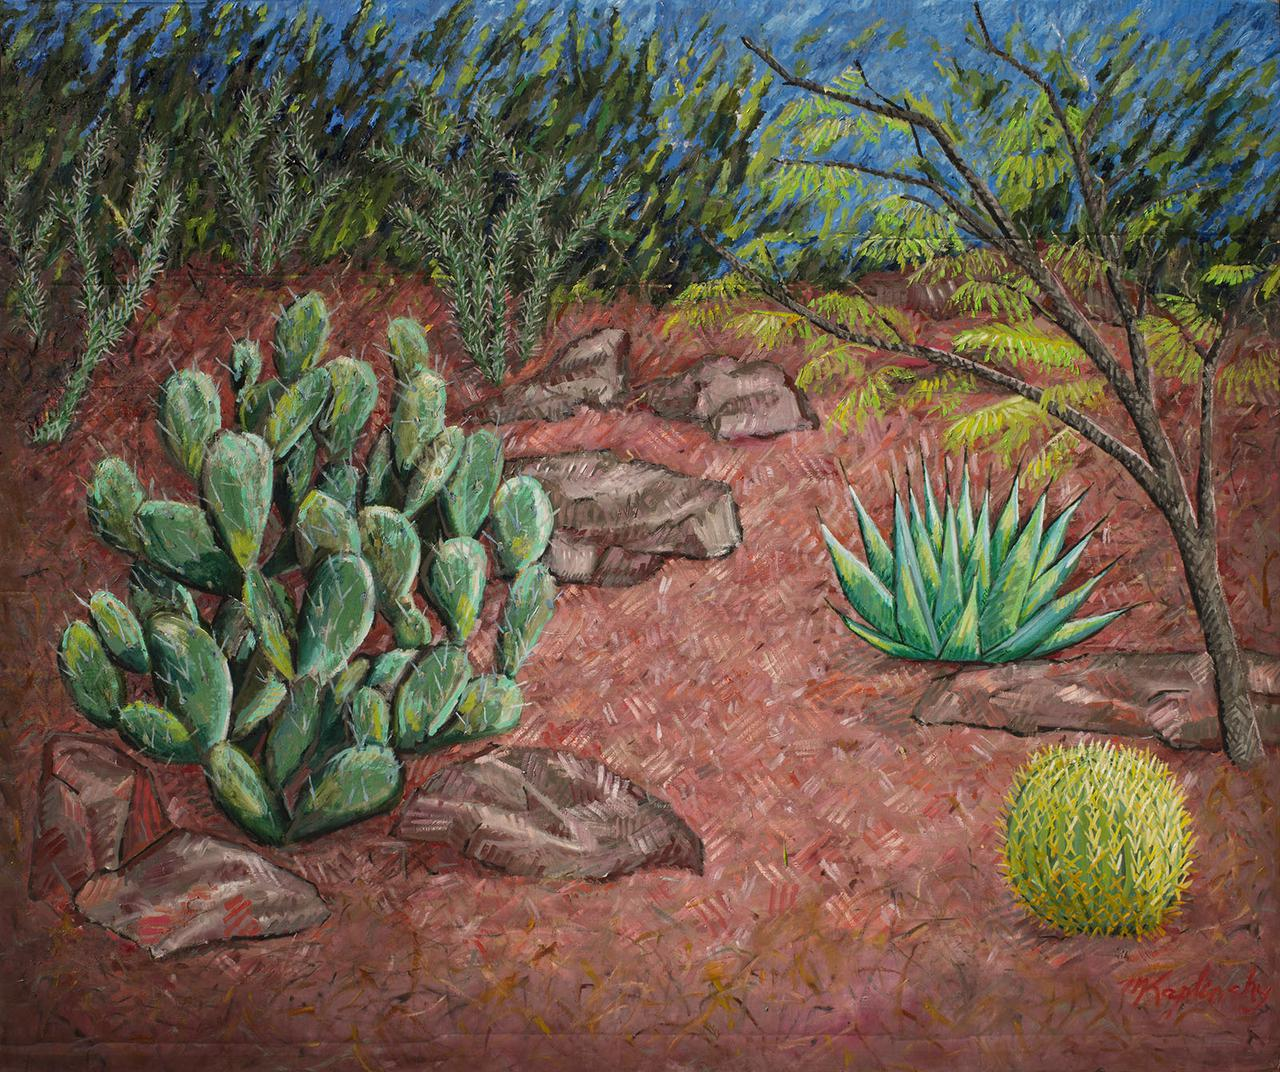 portfolio/Dusk in the New Mexico Courtyard - 60x72 oil on cardboard by Matt Kaplinsky.jpg